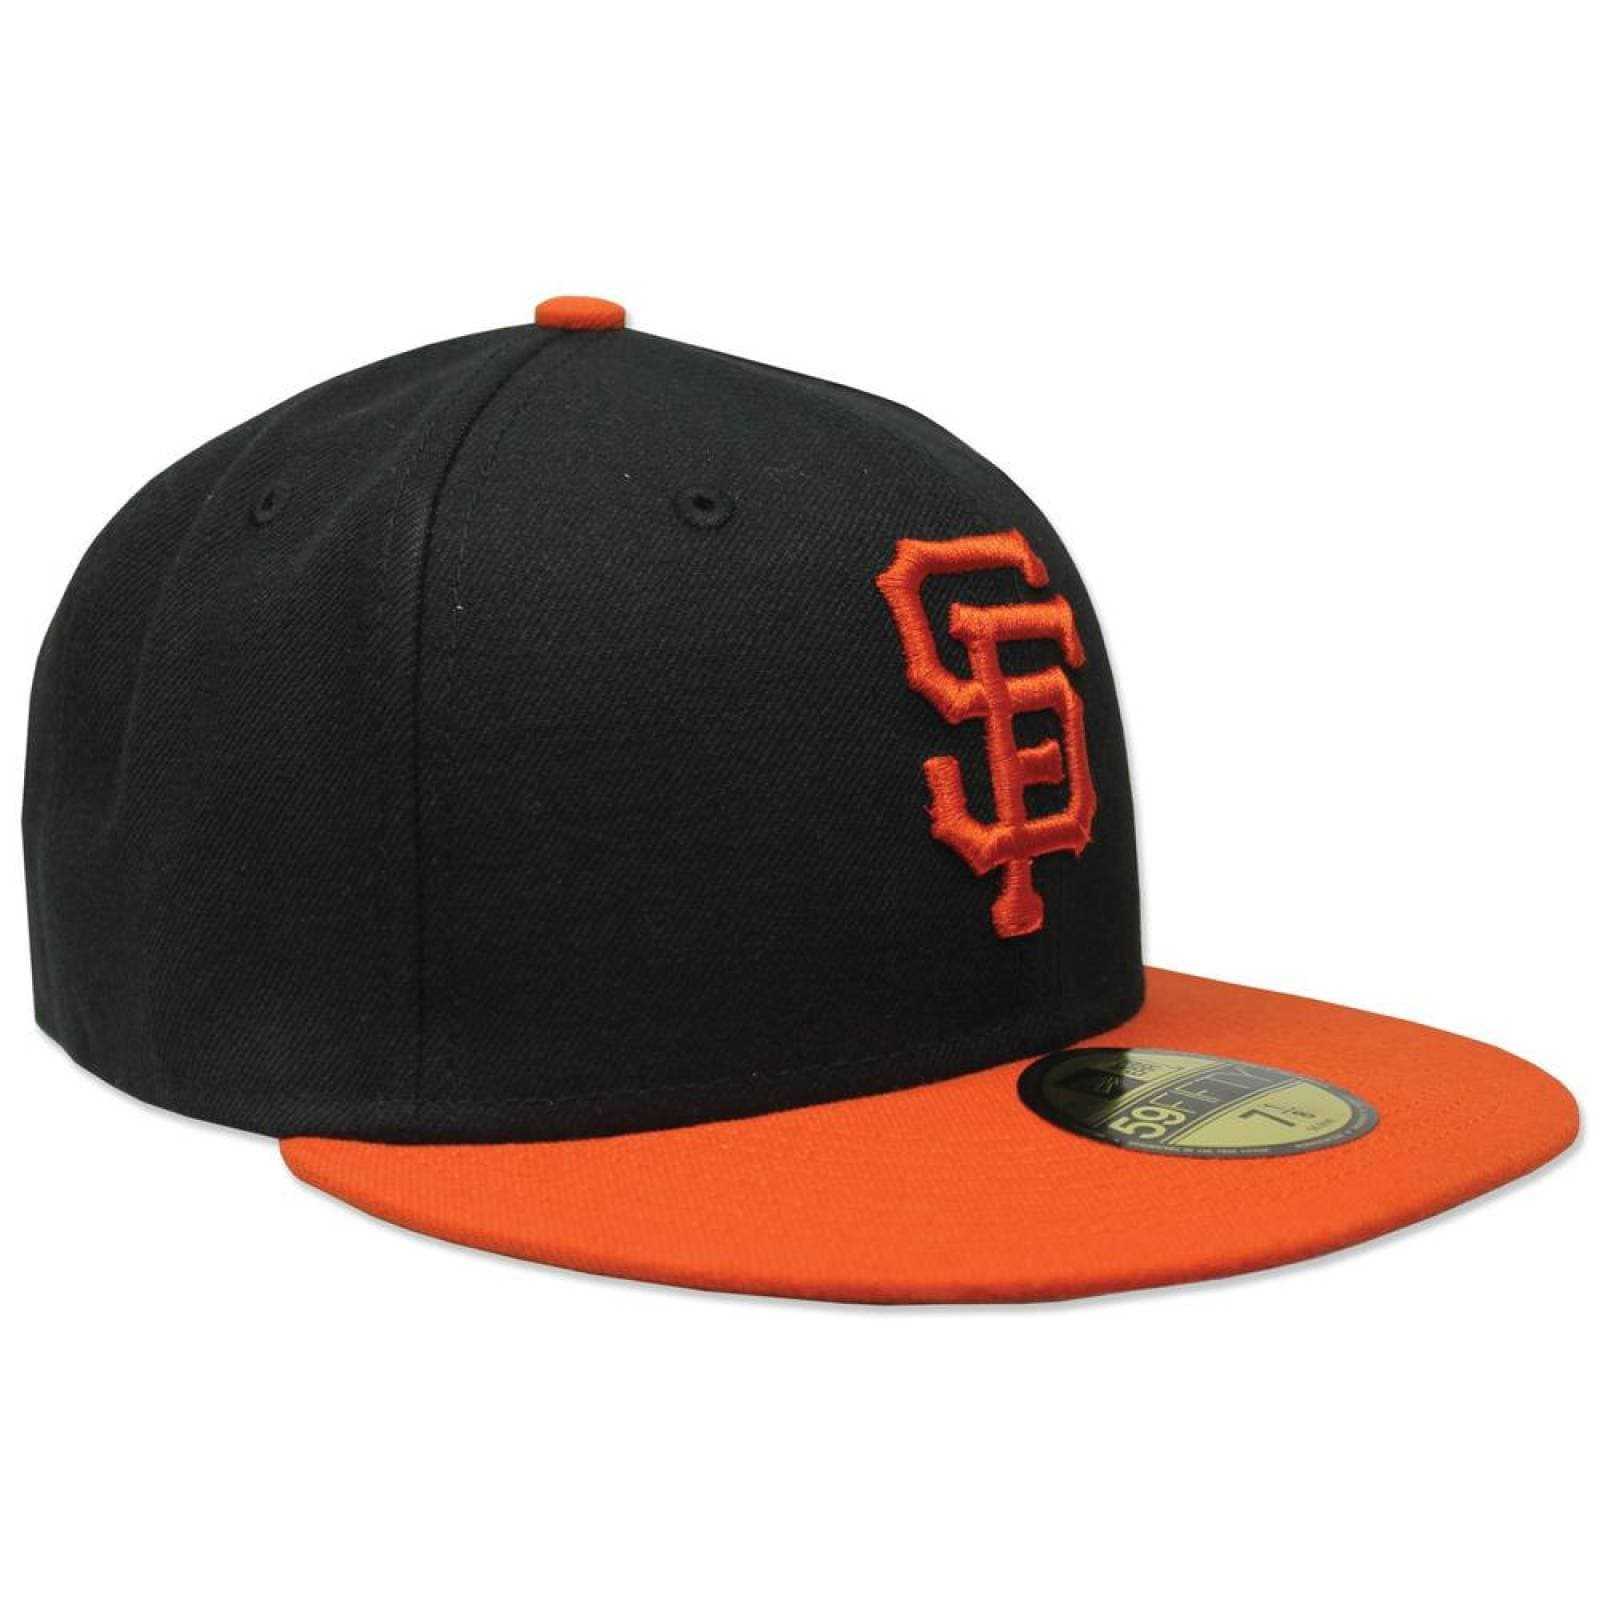 Gorra New Era 5950 Ac Perf Giants Negro Naranja